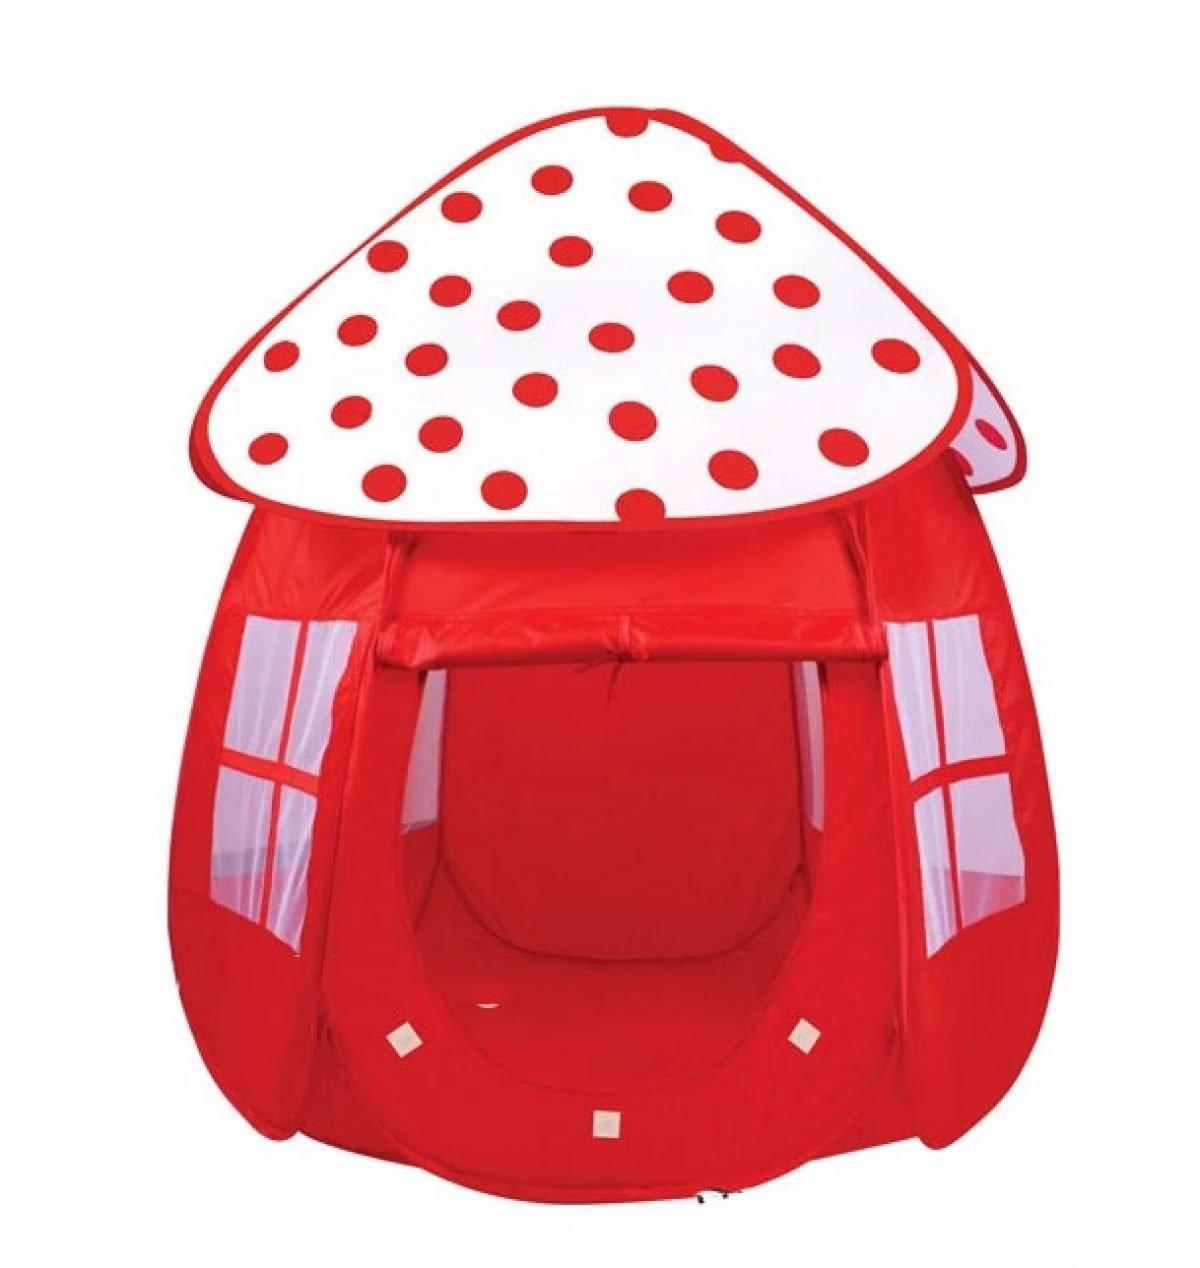 ciuperci copii 2 ani)